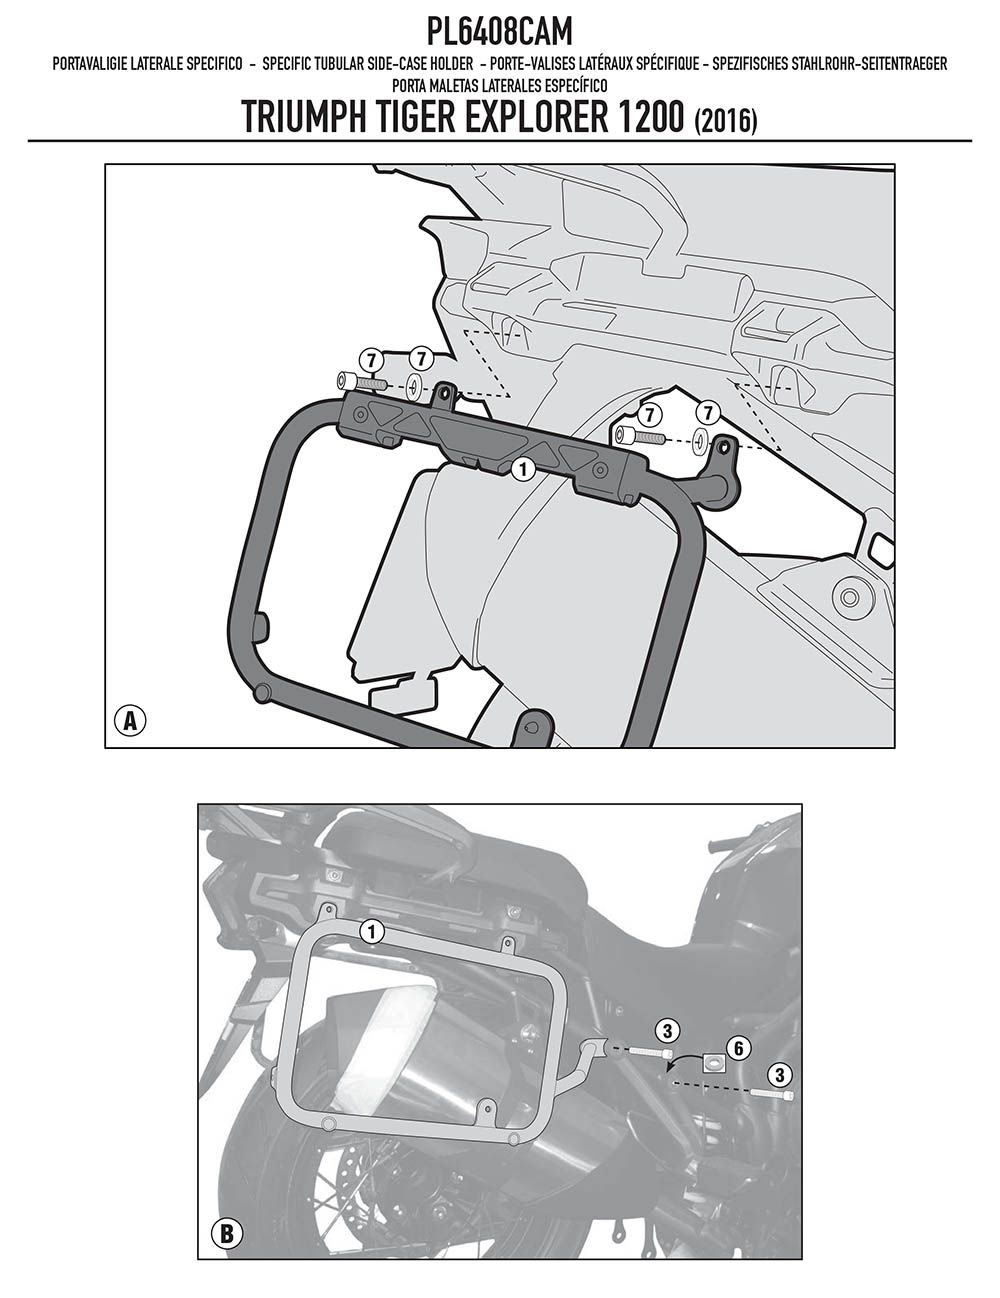 Suporte Lateral Bau Mala Tiger Explorer 1200 Aluminio Givi